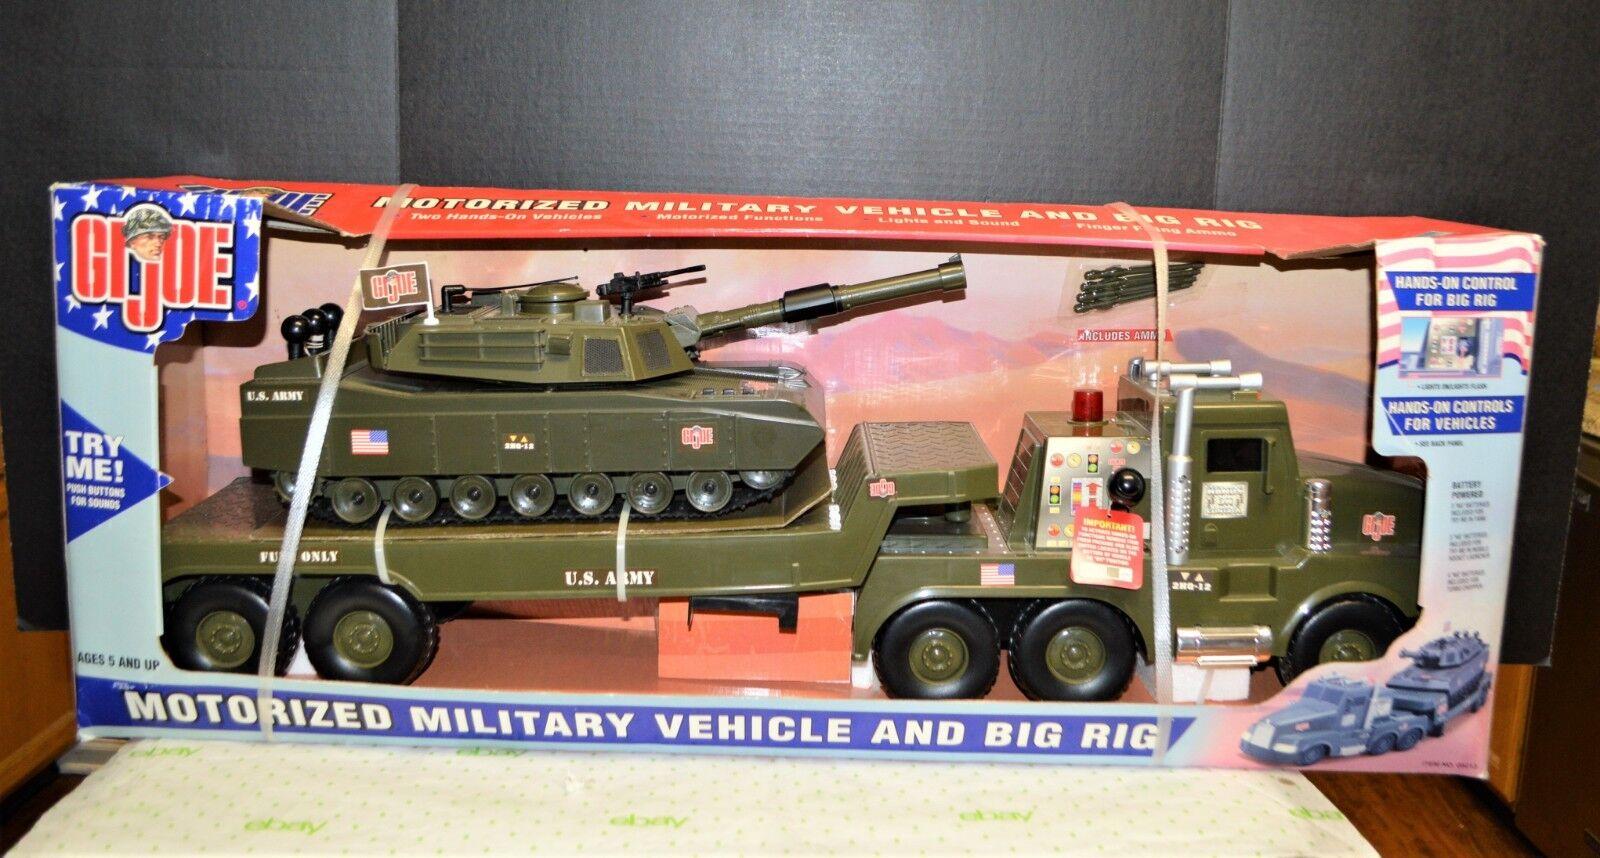 GI Joe Motorized Military Vehicle and Big Rig Hasbro 2002 Unopened 35 x 12  NIB